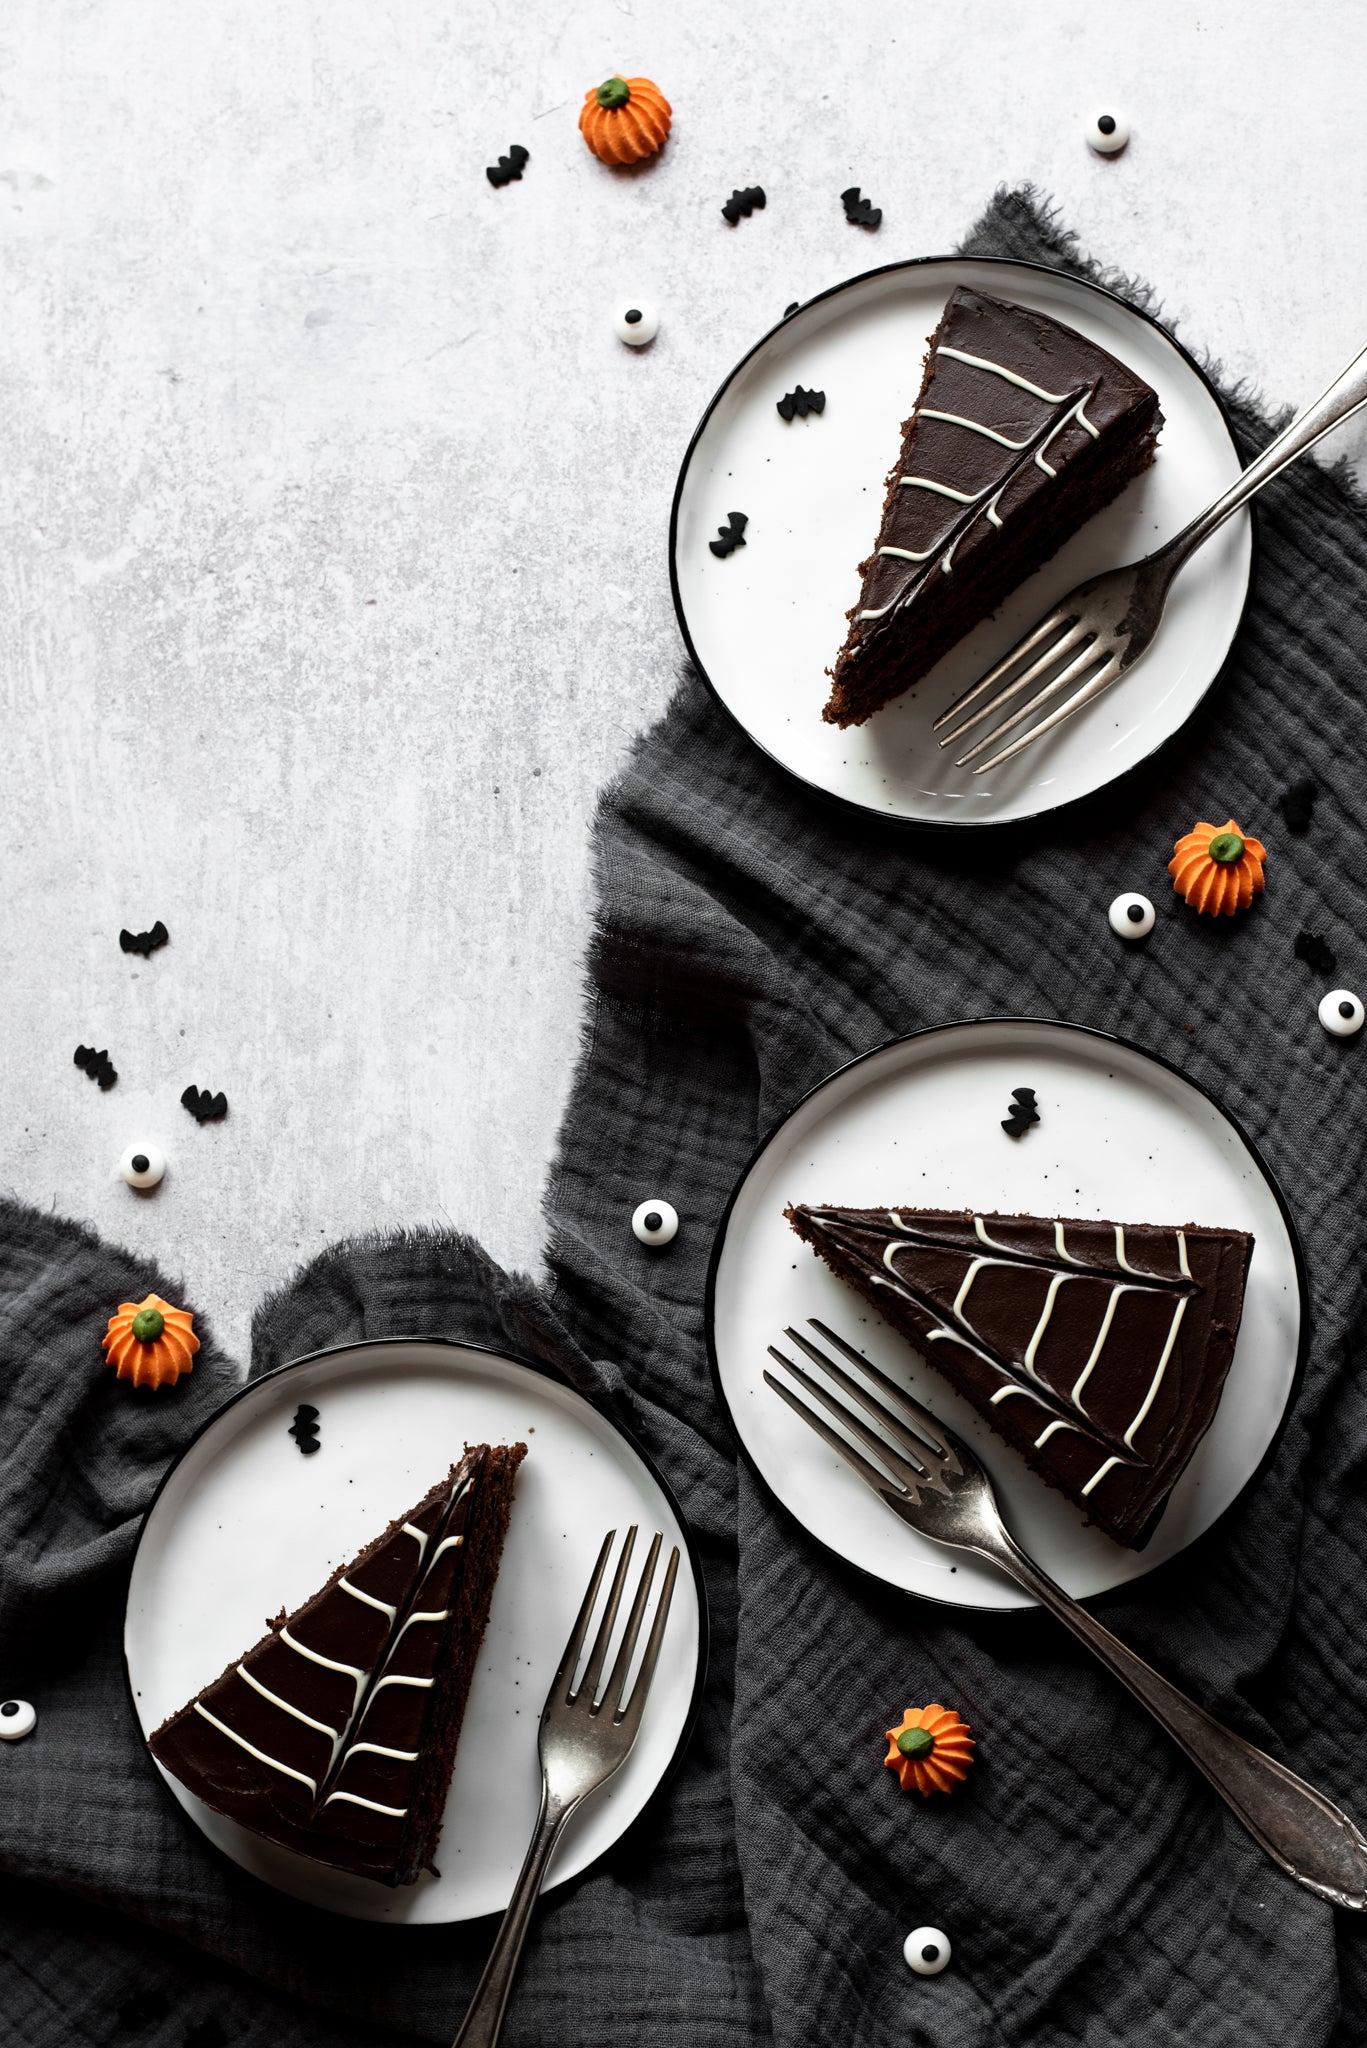 Spider-Web-Cake-WEB-RES-5.jpg